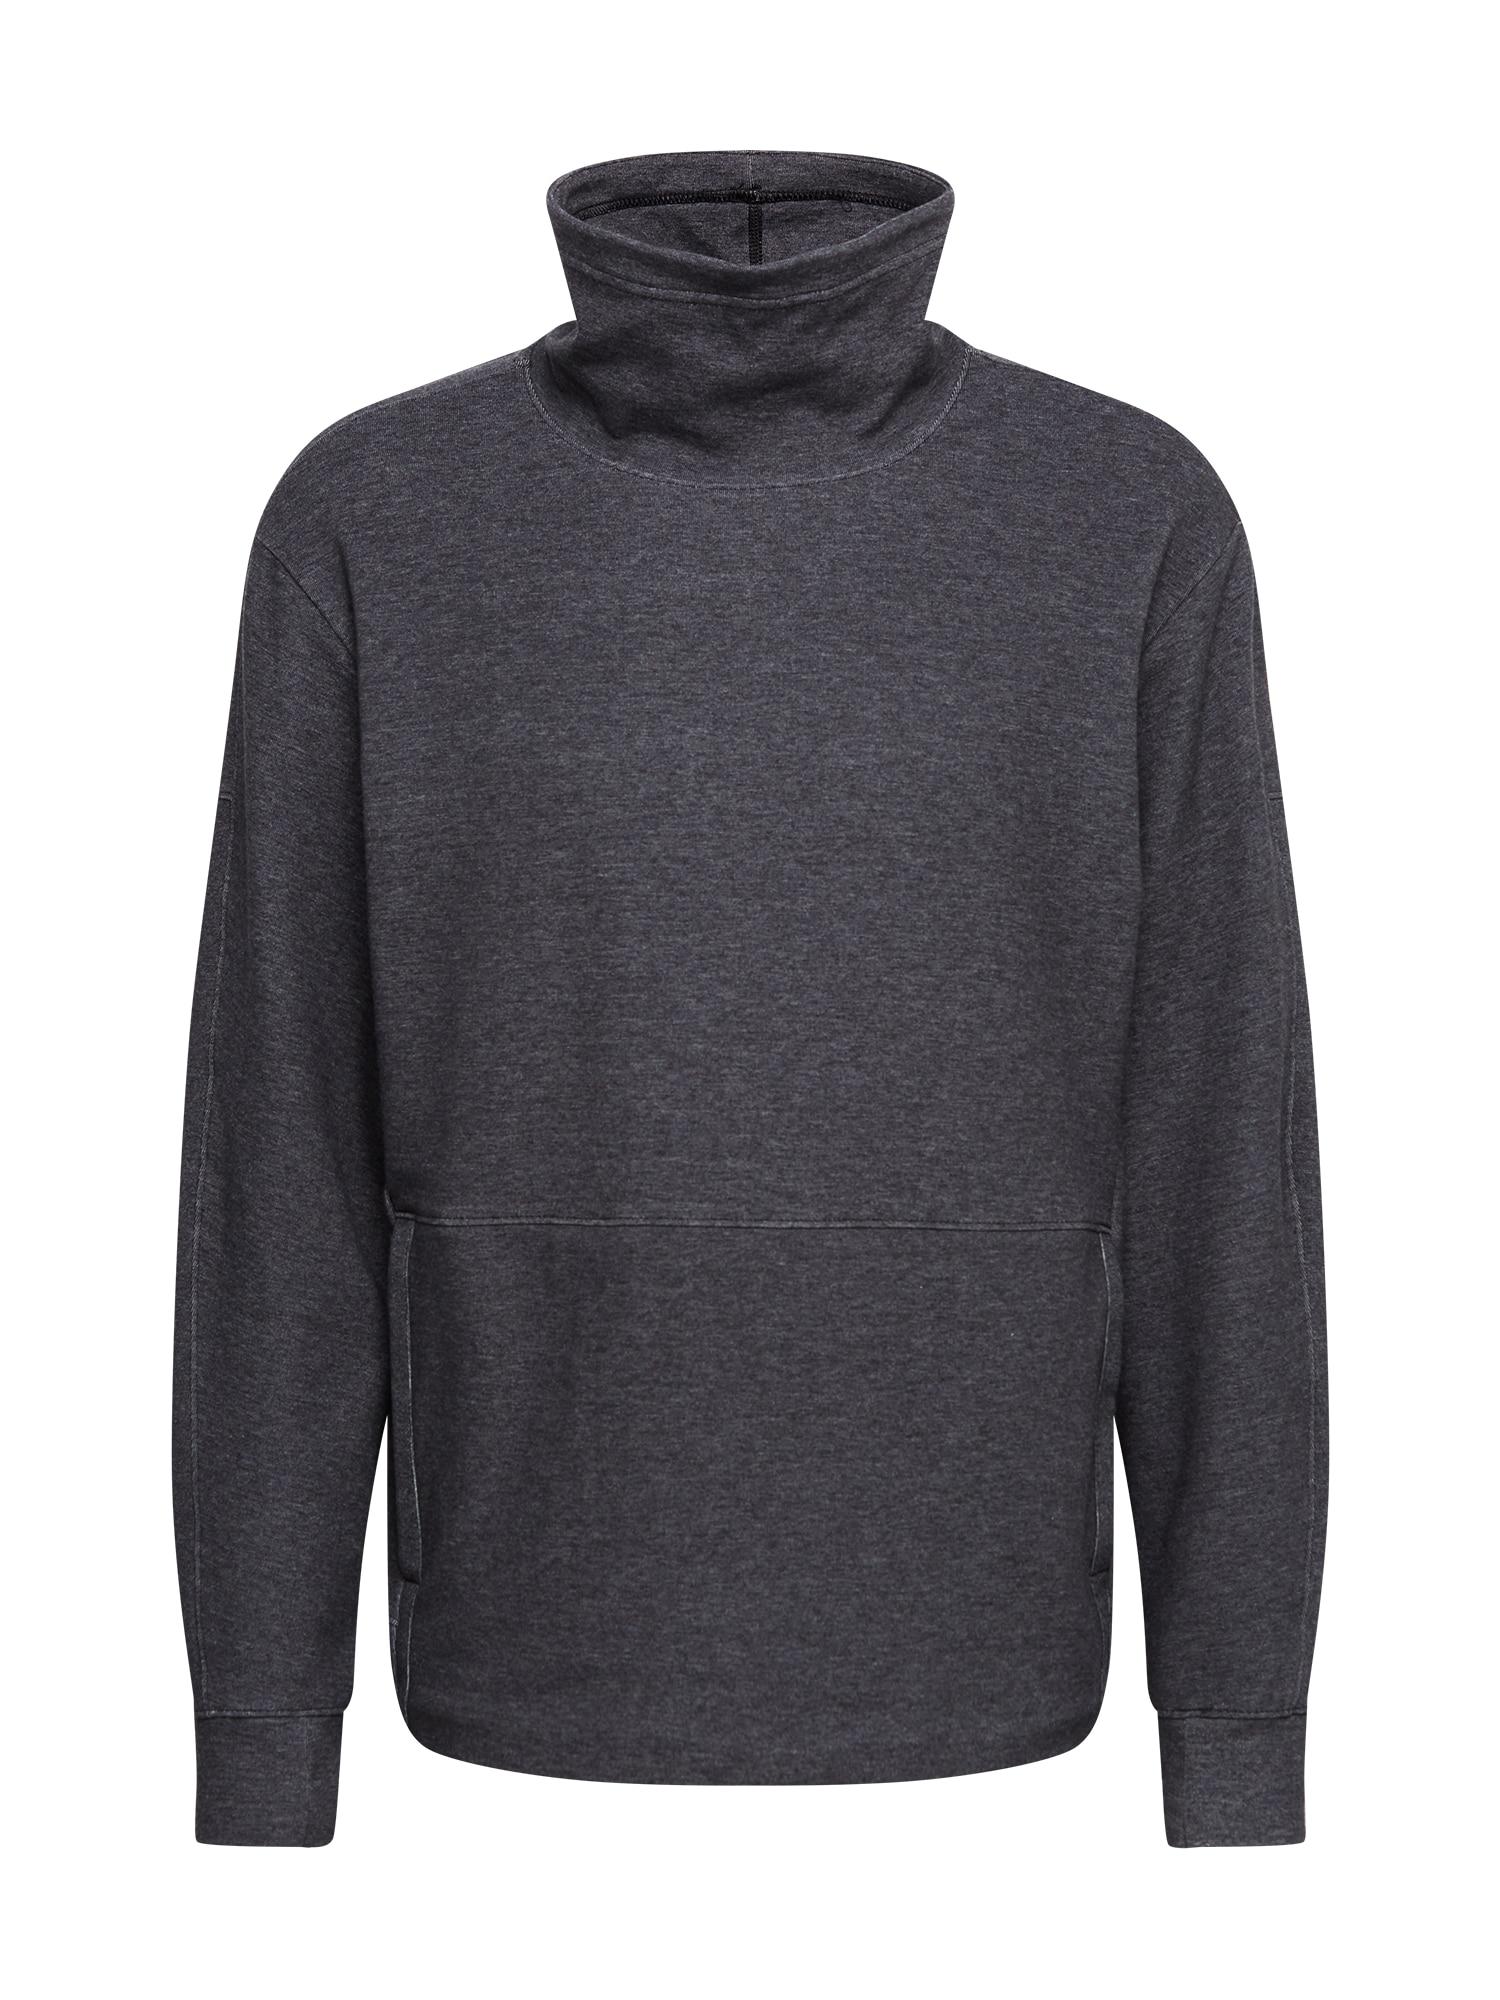 NIKE Sportinis megztinis margai juoda